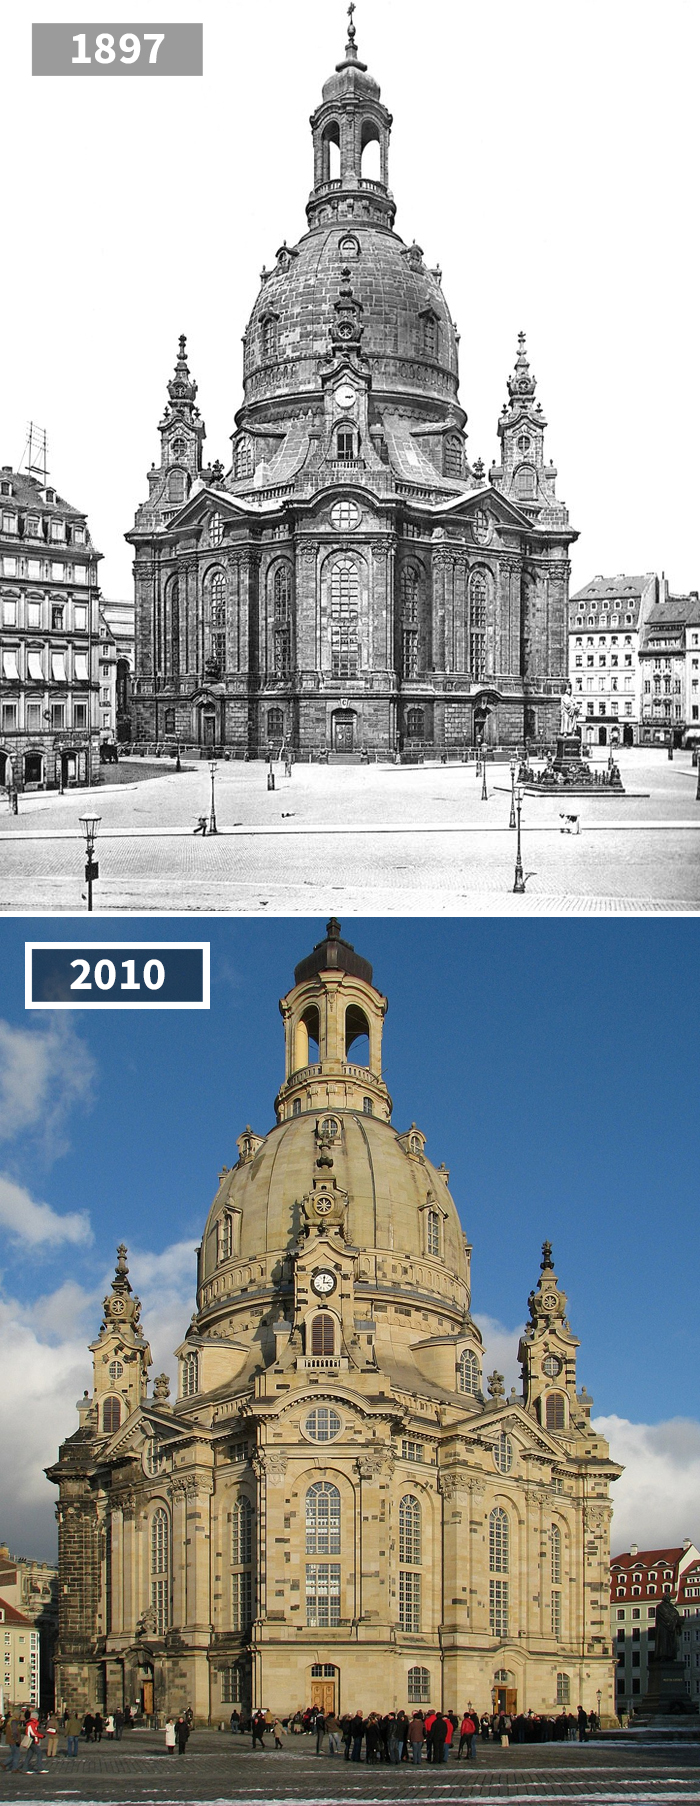 Frauenkirche Dresden, Dresden, Germany, 1897 - 2010